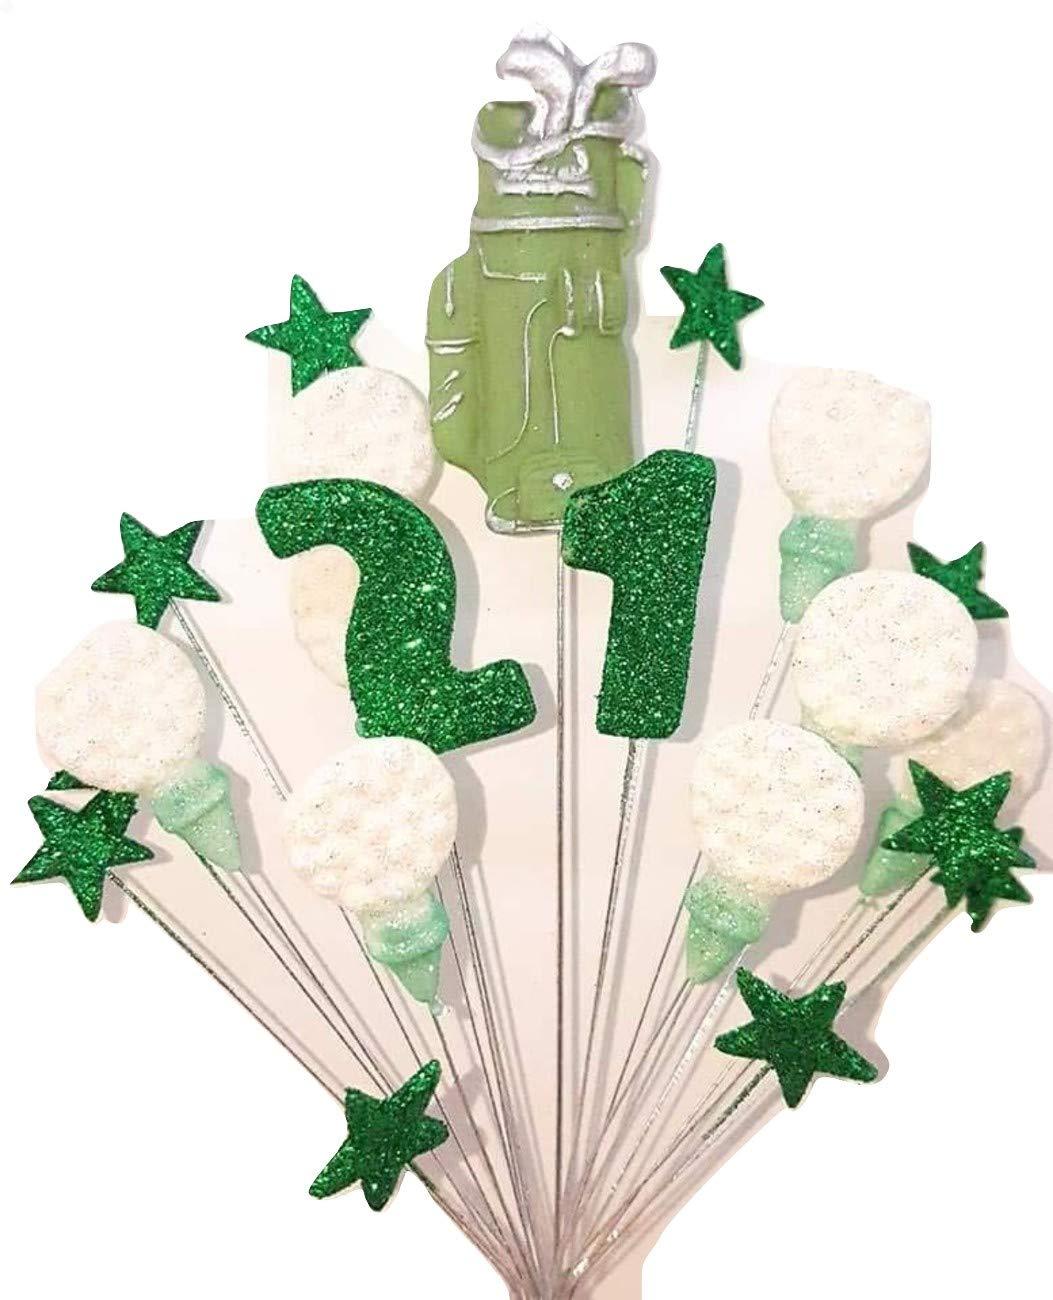 Stupendous Golf 21St Birthday Cake Topper Decoration Green White Handmade Personalised Birthday Cards Epsylily Jamesorg